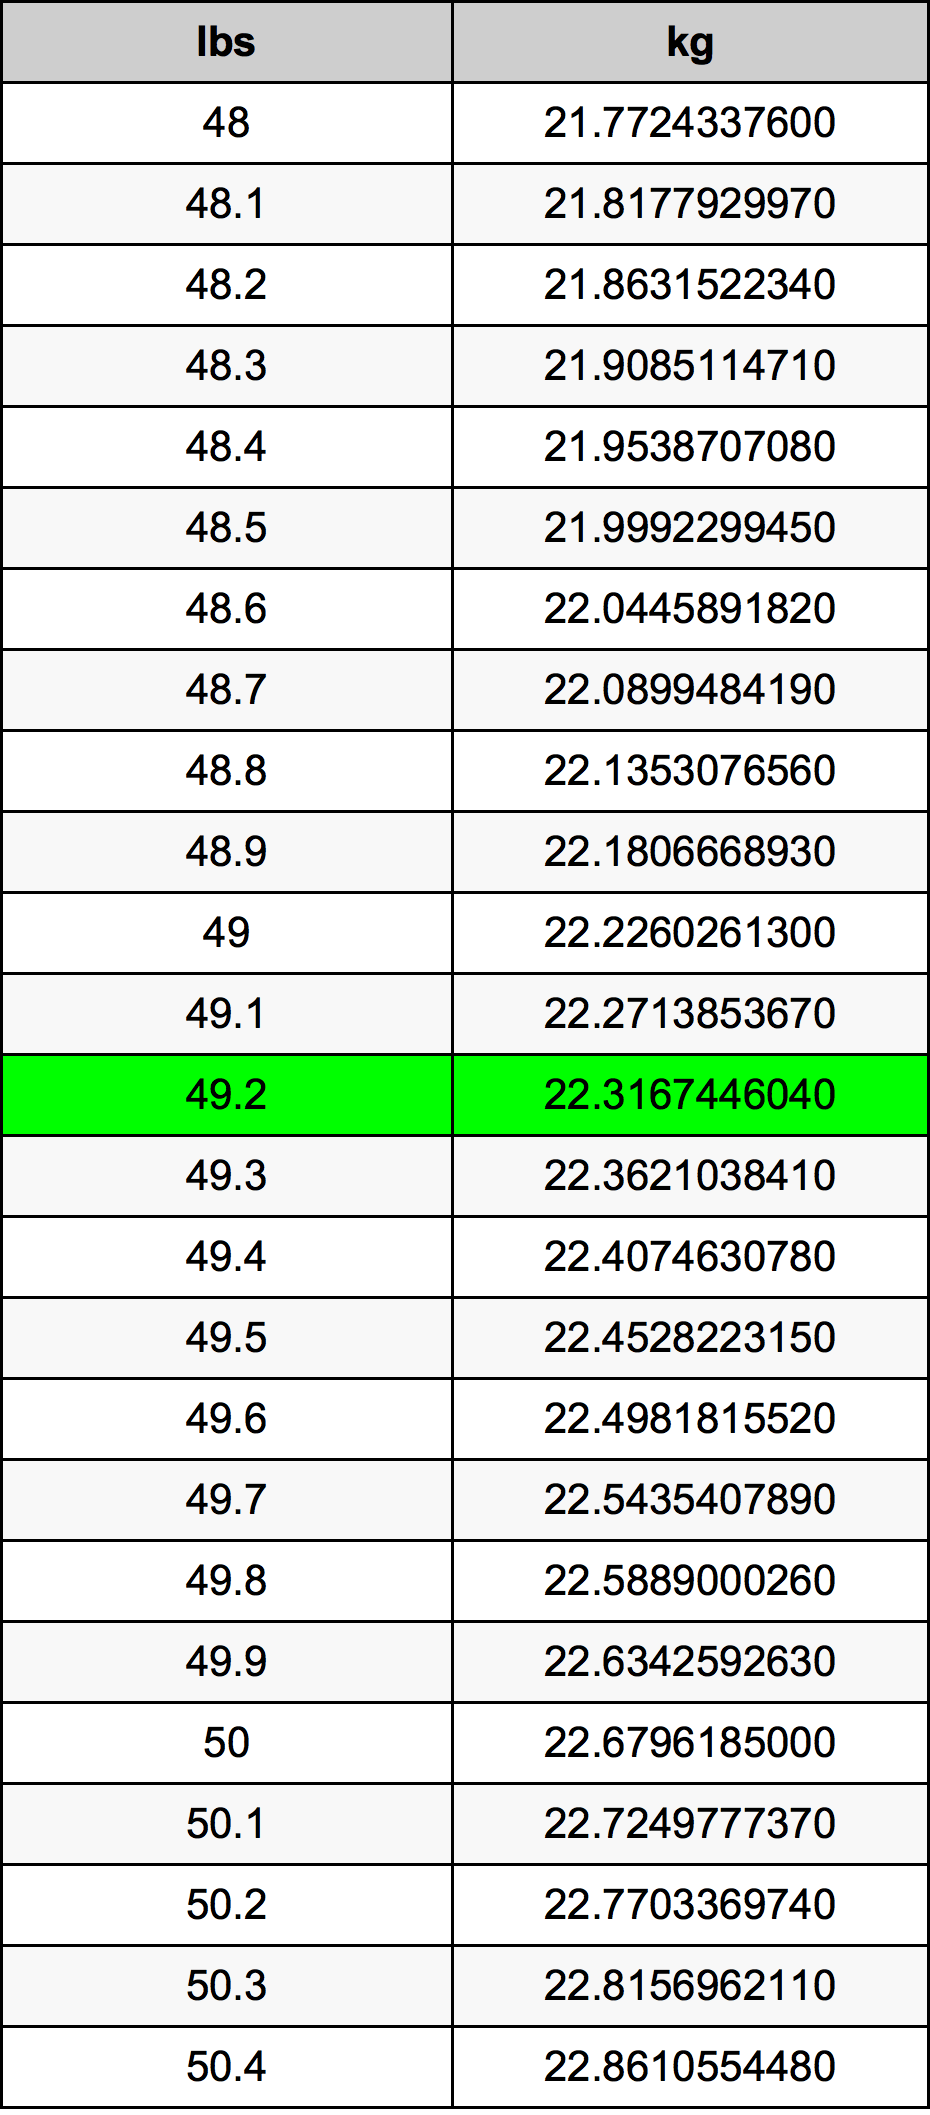 49.2 Libra konverteringstabellen